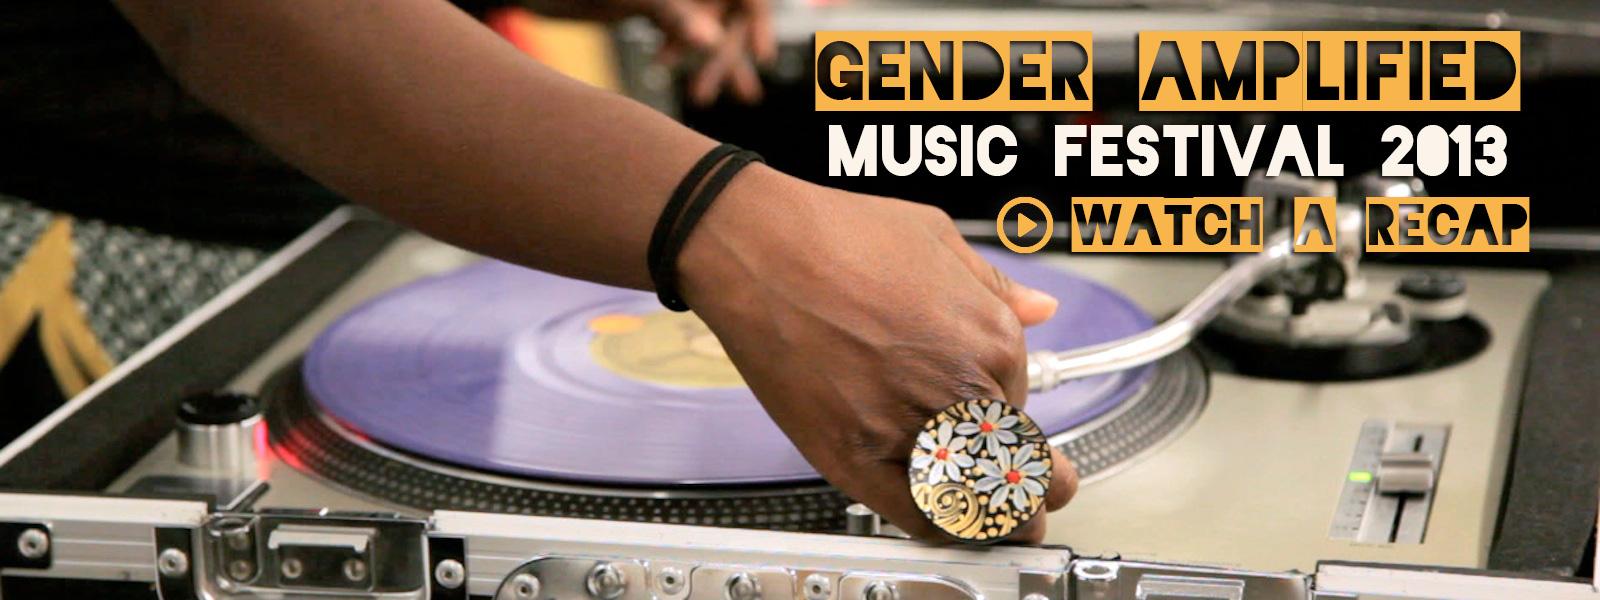 Gender Amplified Music Festival 2013